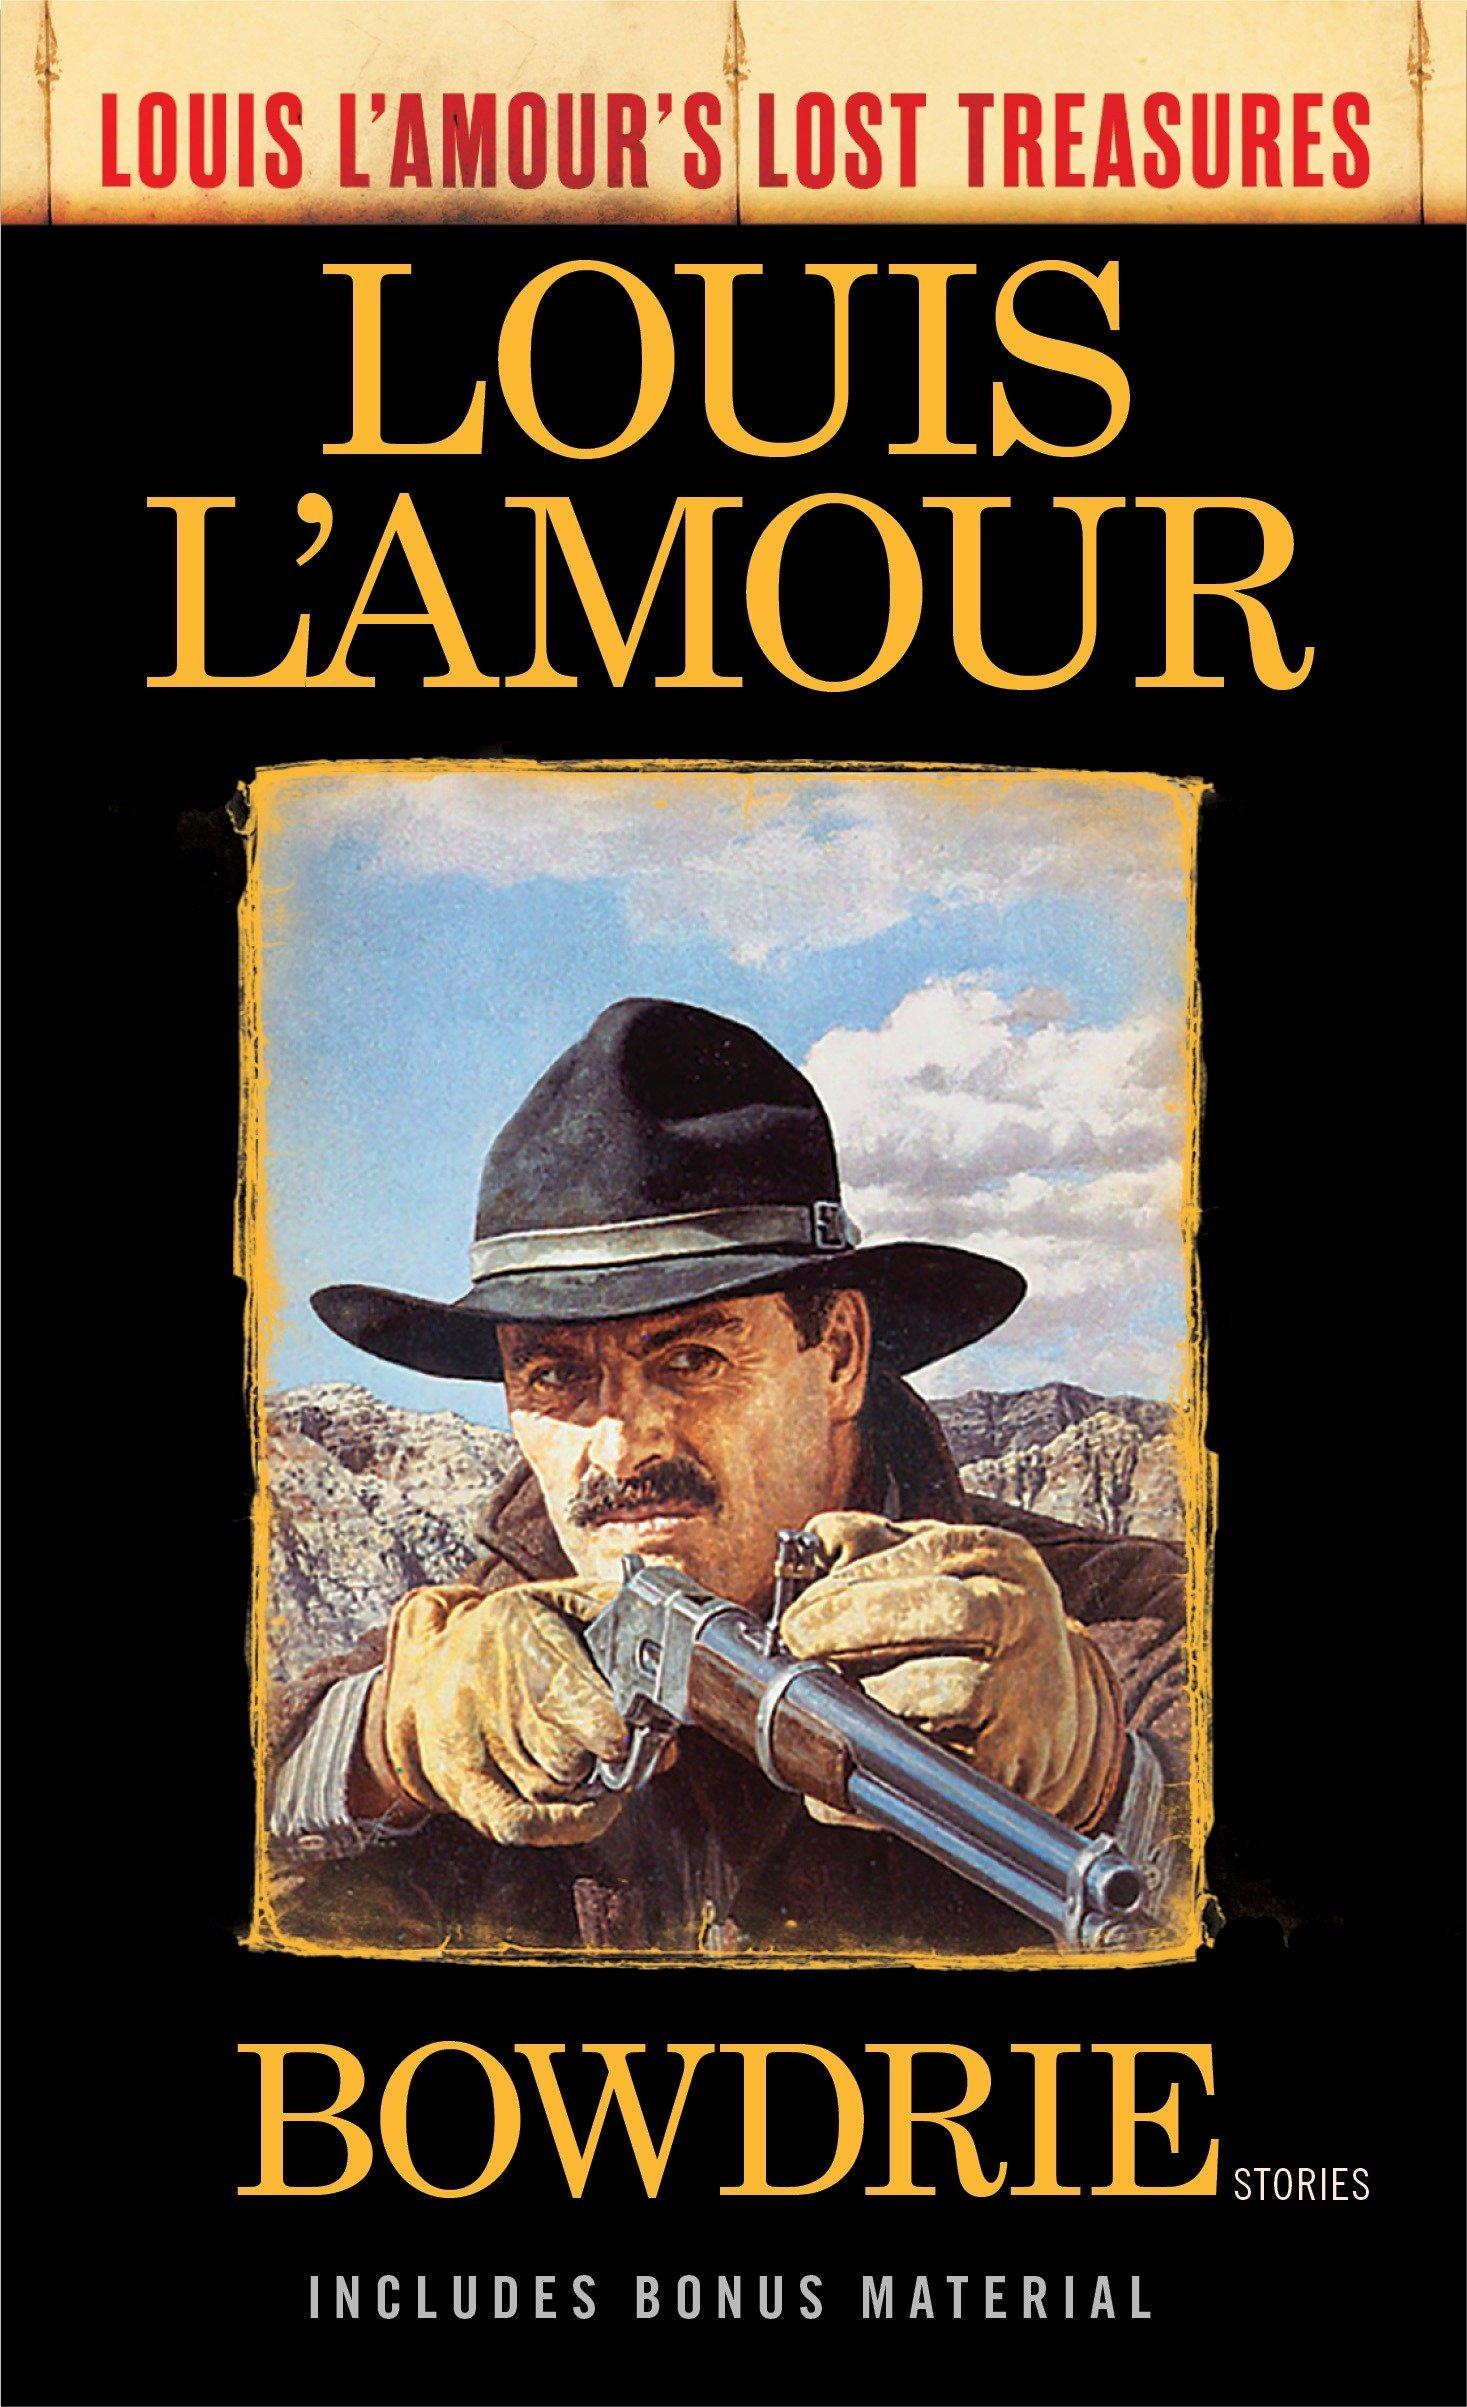 Read Online Bowdrie (Louis L'Amour's Lost Treasures): Stories pdf epub